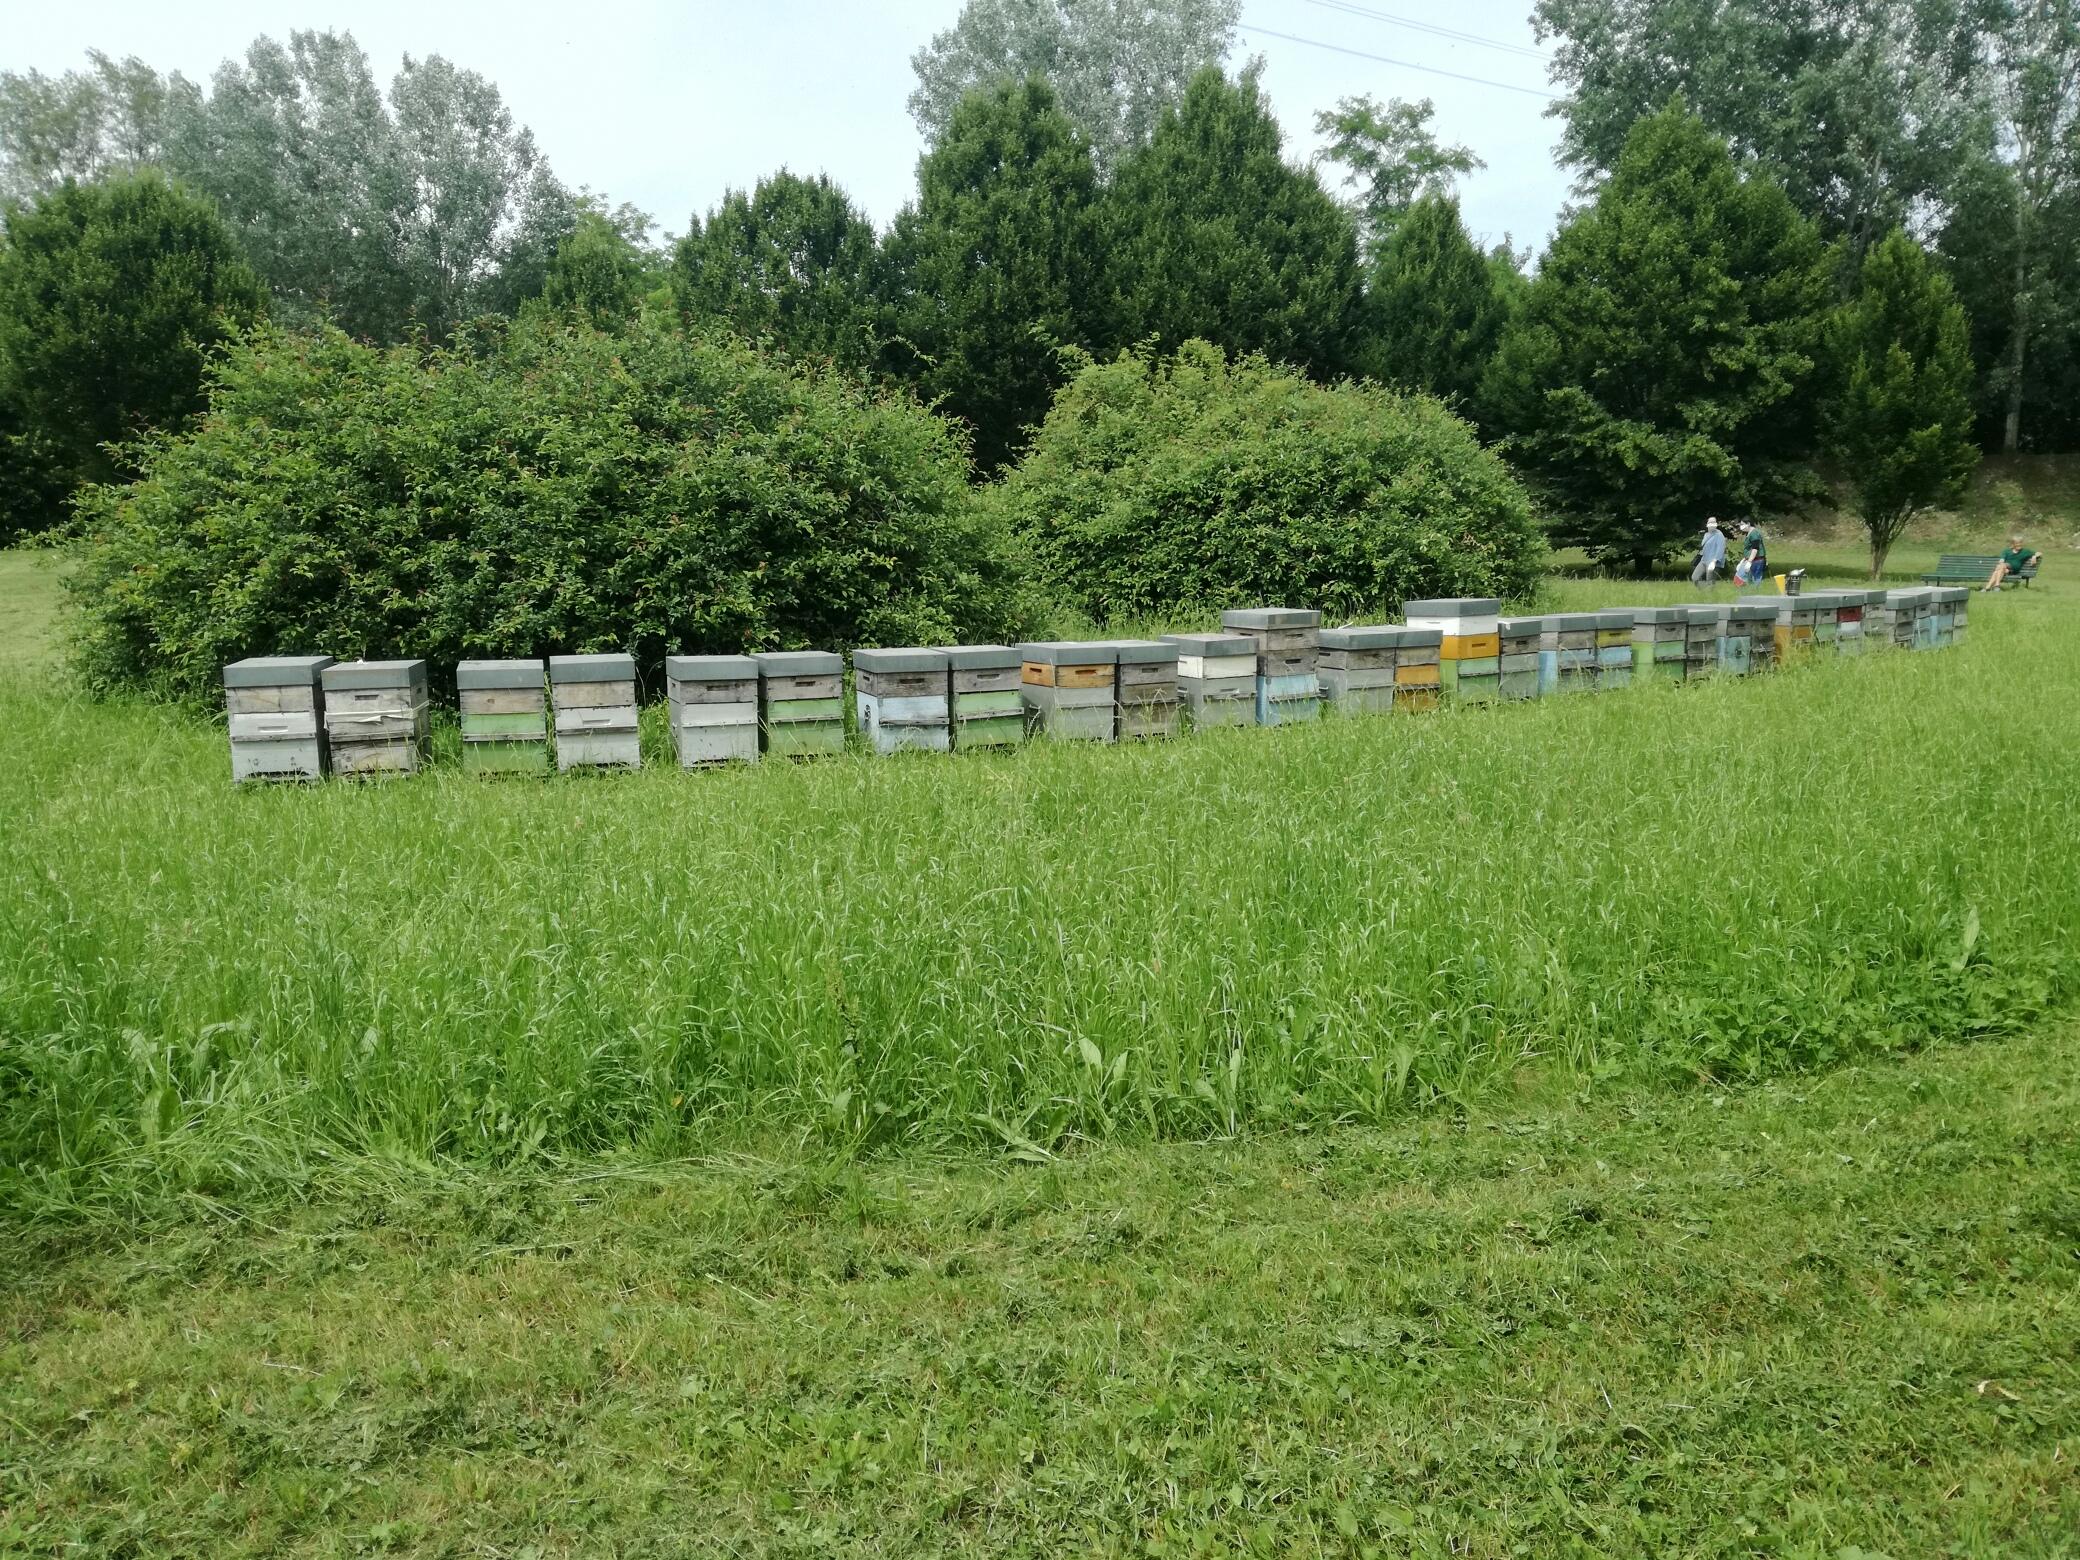 arnia apicoltura nei parchi